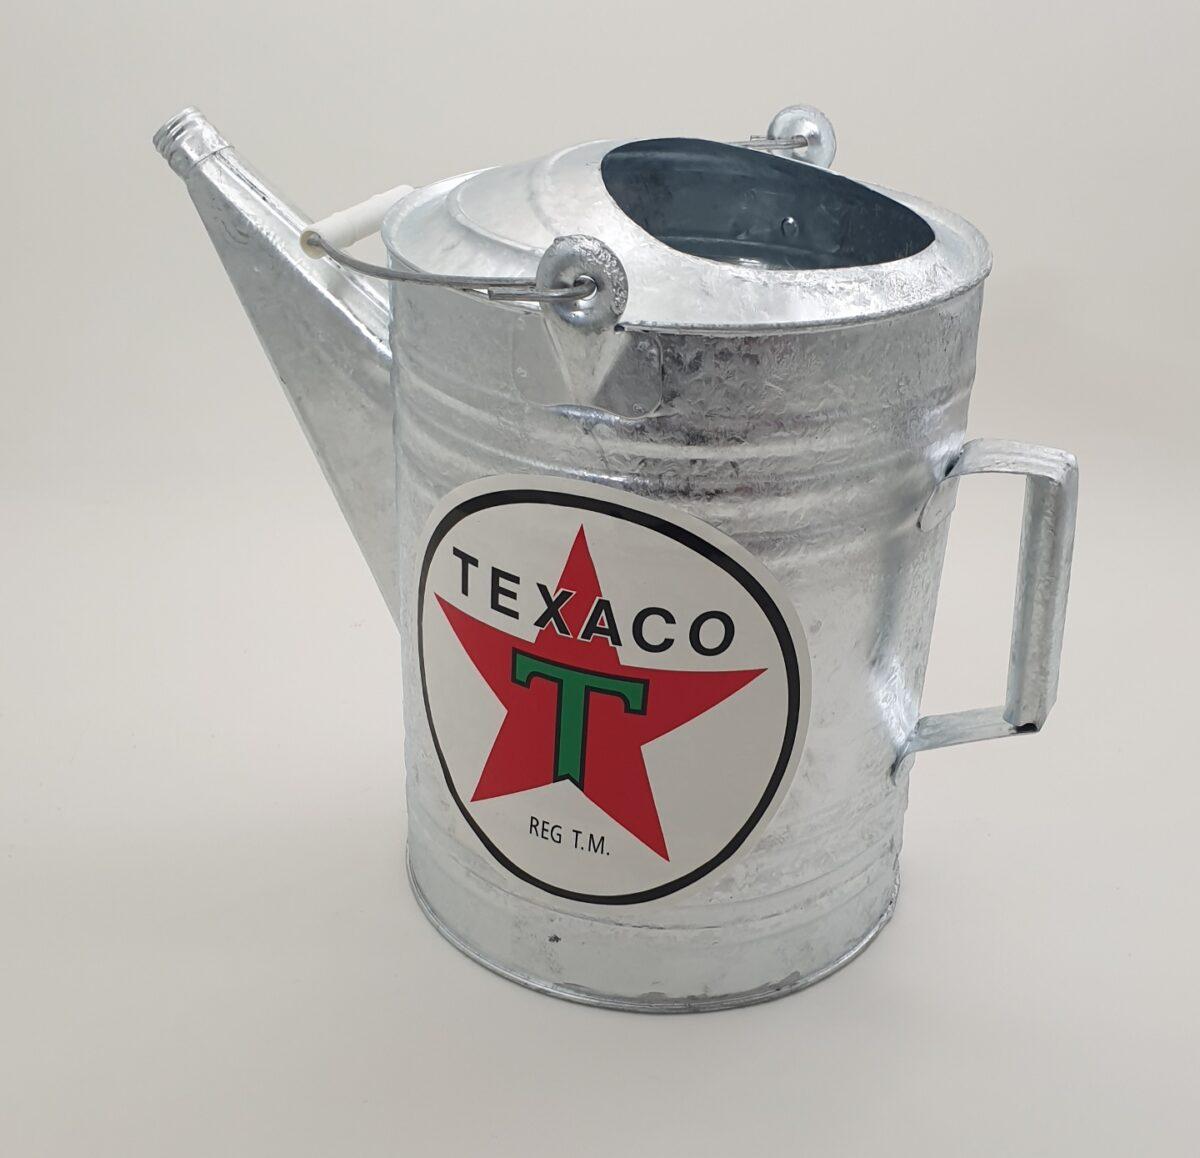 Seau Galvanise De Garagiste Texaco